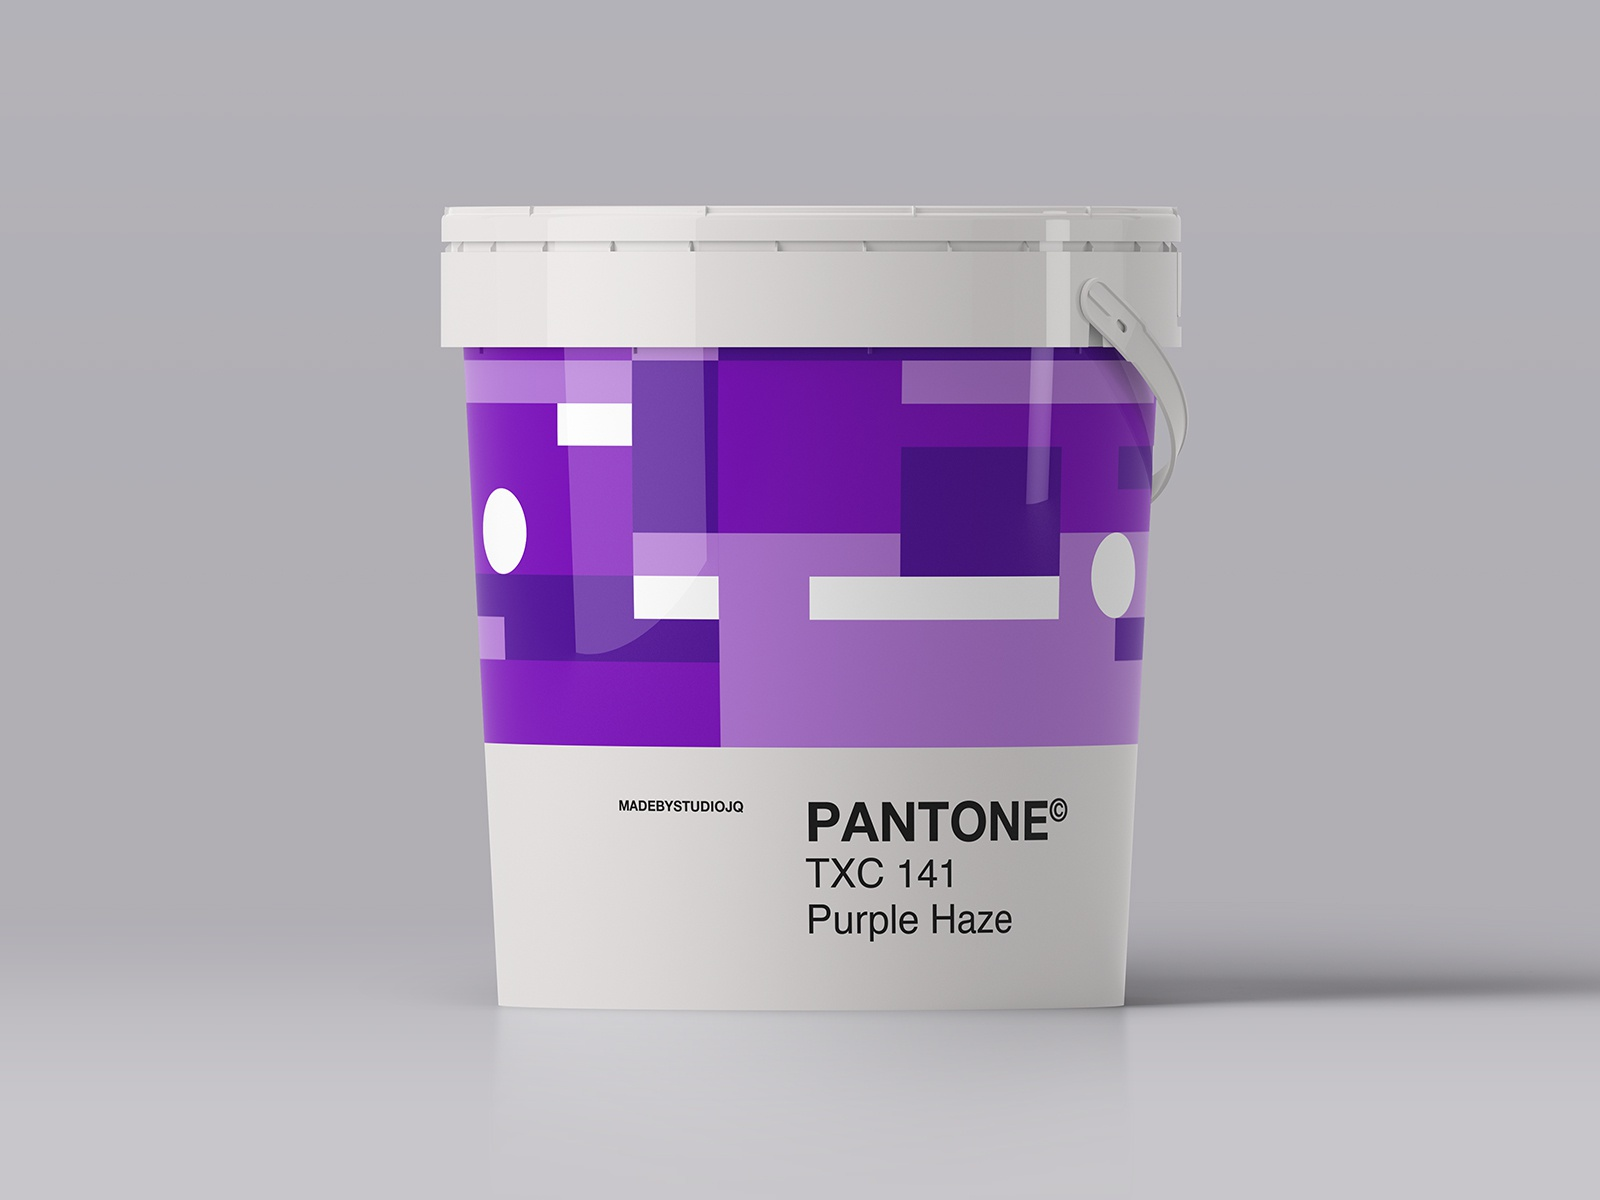 Pantone paint purplehaze